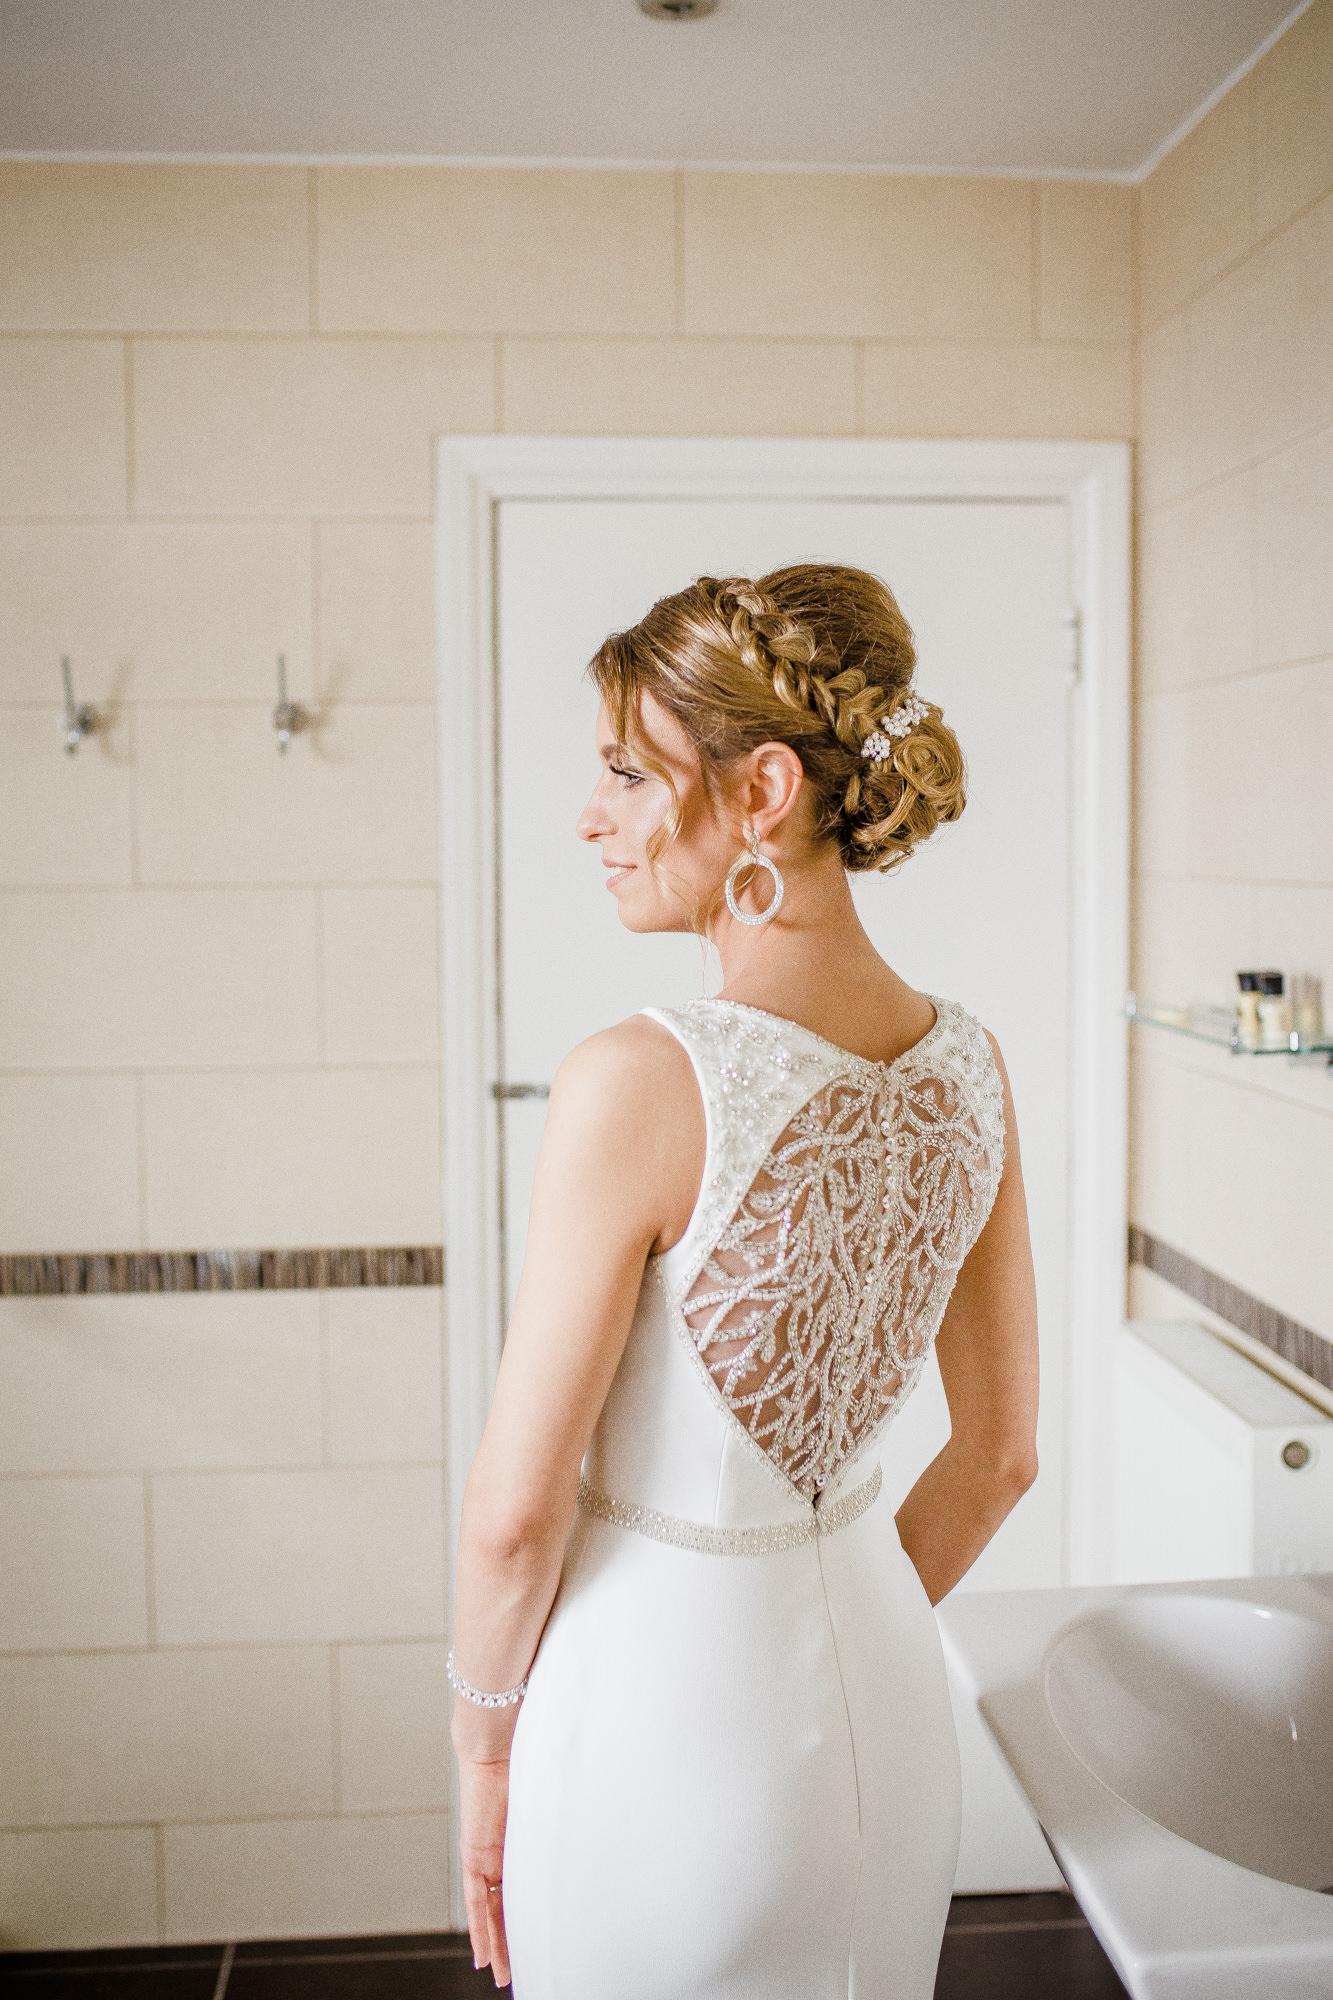 Bride Getting Ready Wedding Photography Sussex Vilcinskaite Photo